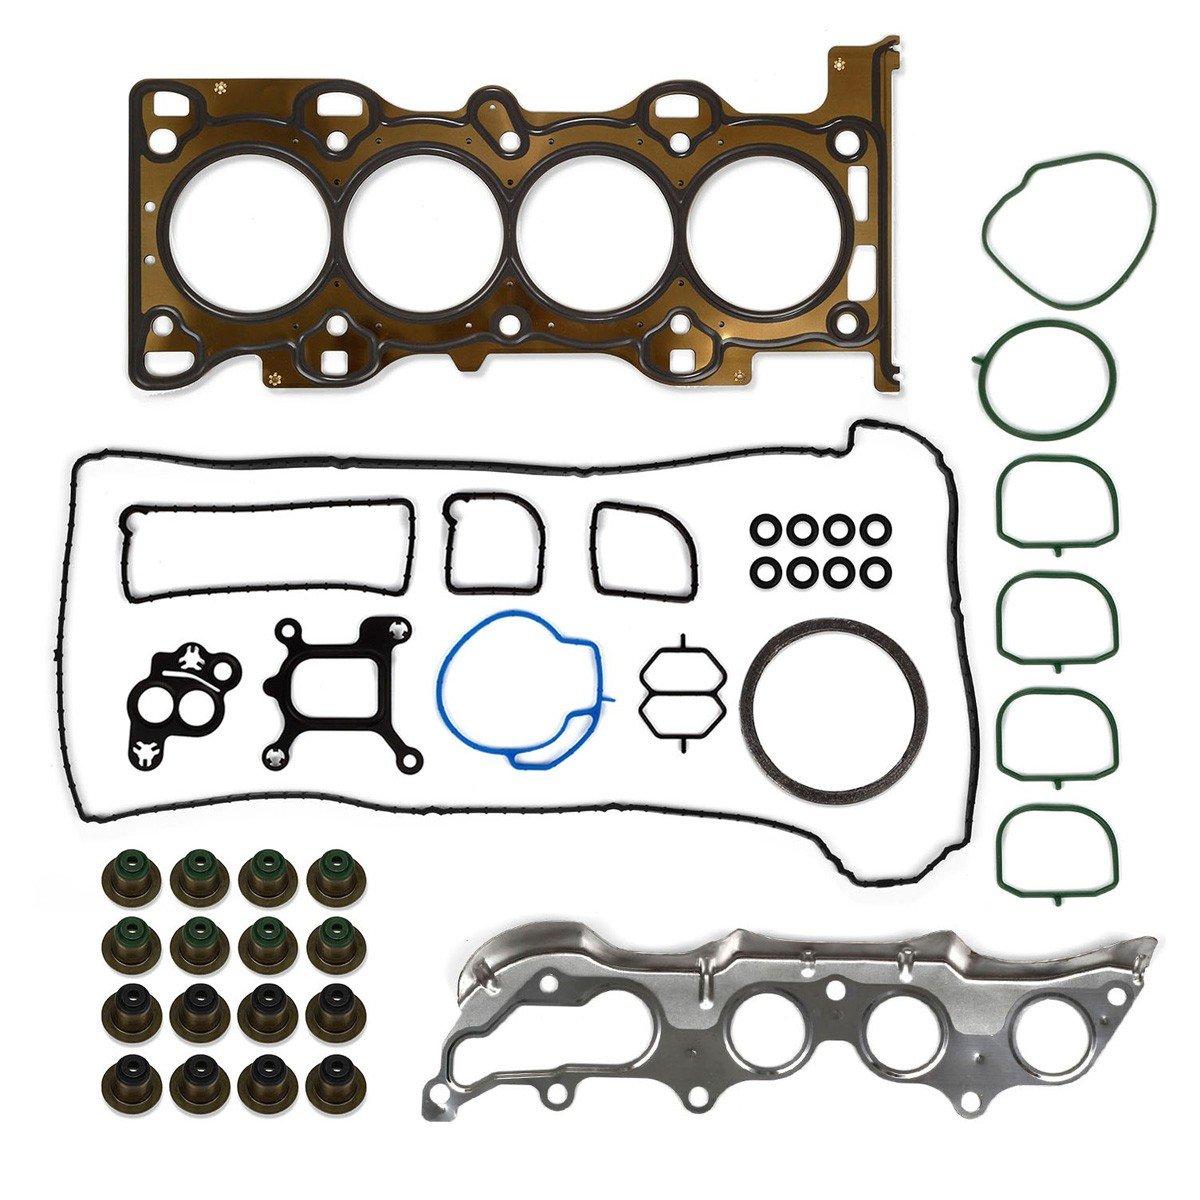 Fits For 2003 04 05 06 07 08 09 10 11 Mazda 3 6 5 Ford Focus 2.0 2.3 Head Gasket Set